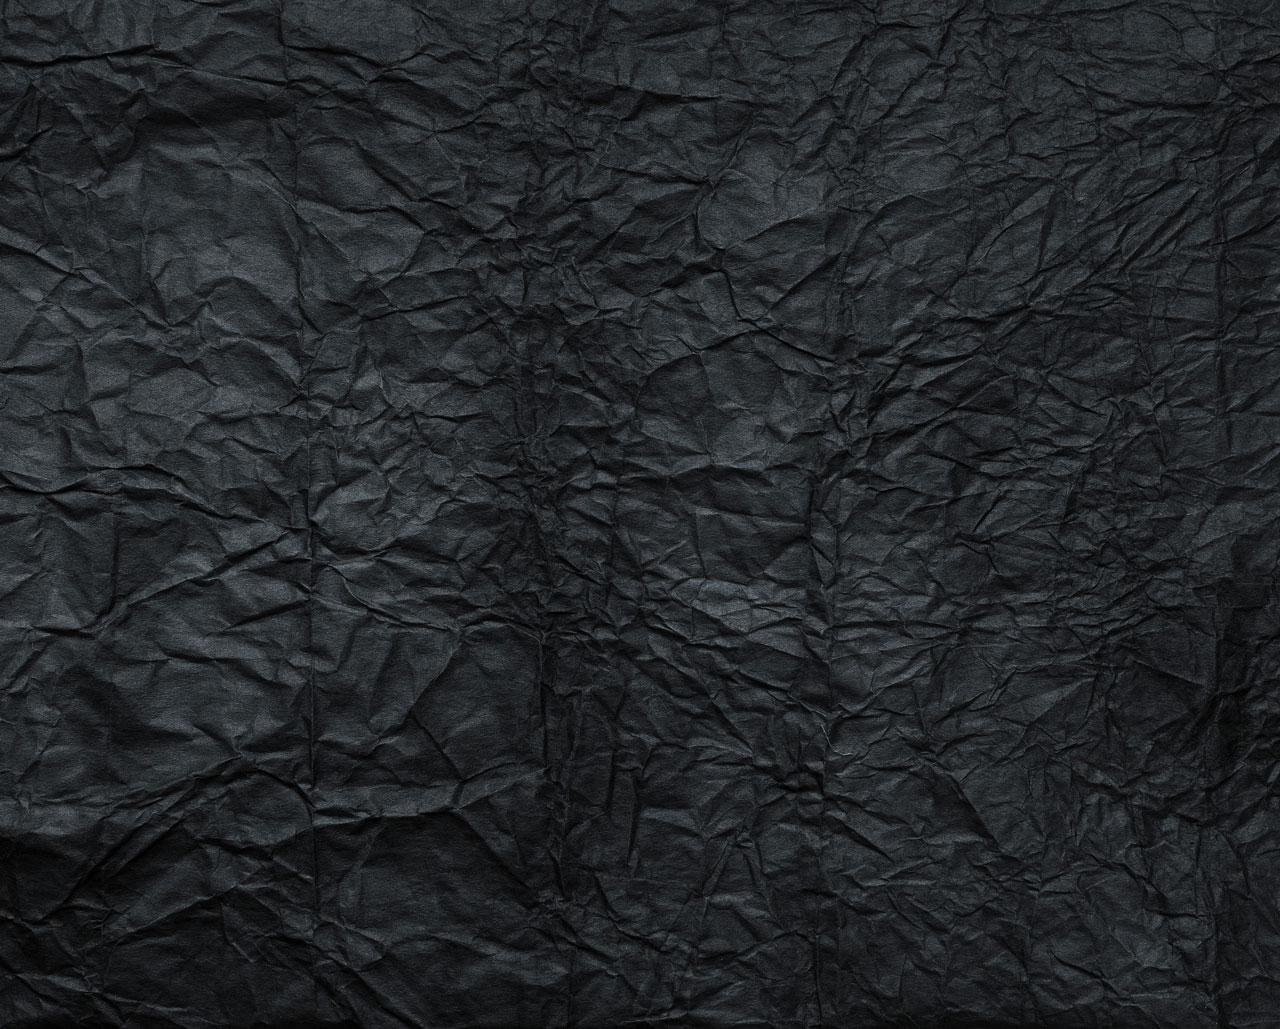 wildtextures-gevouwen-black-paper-texture